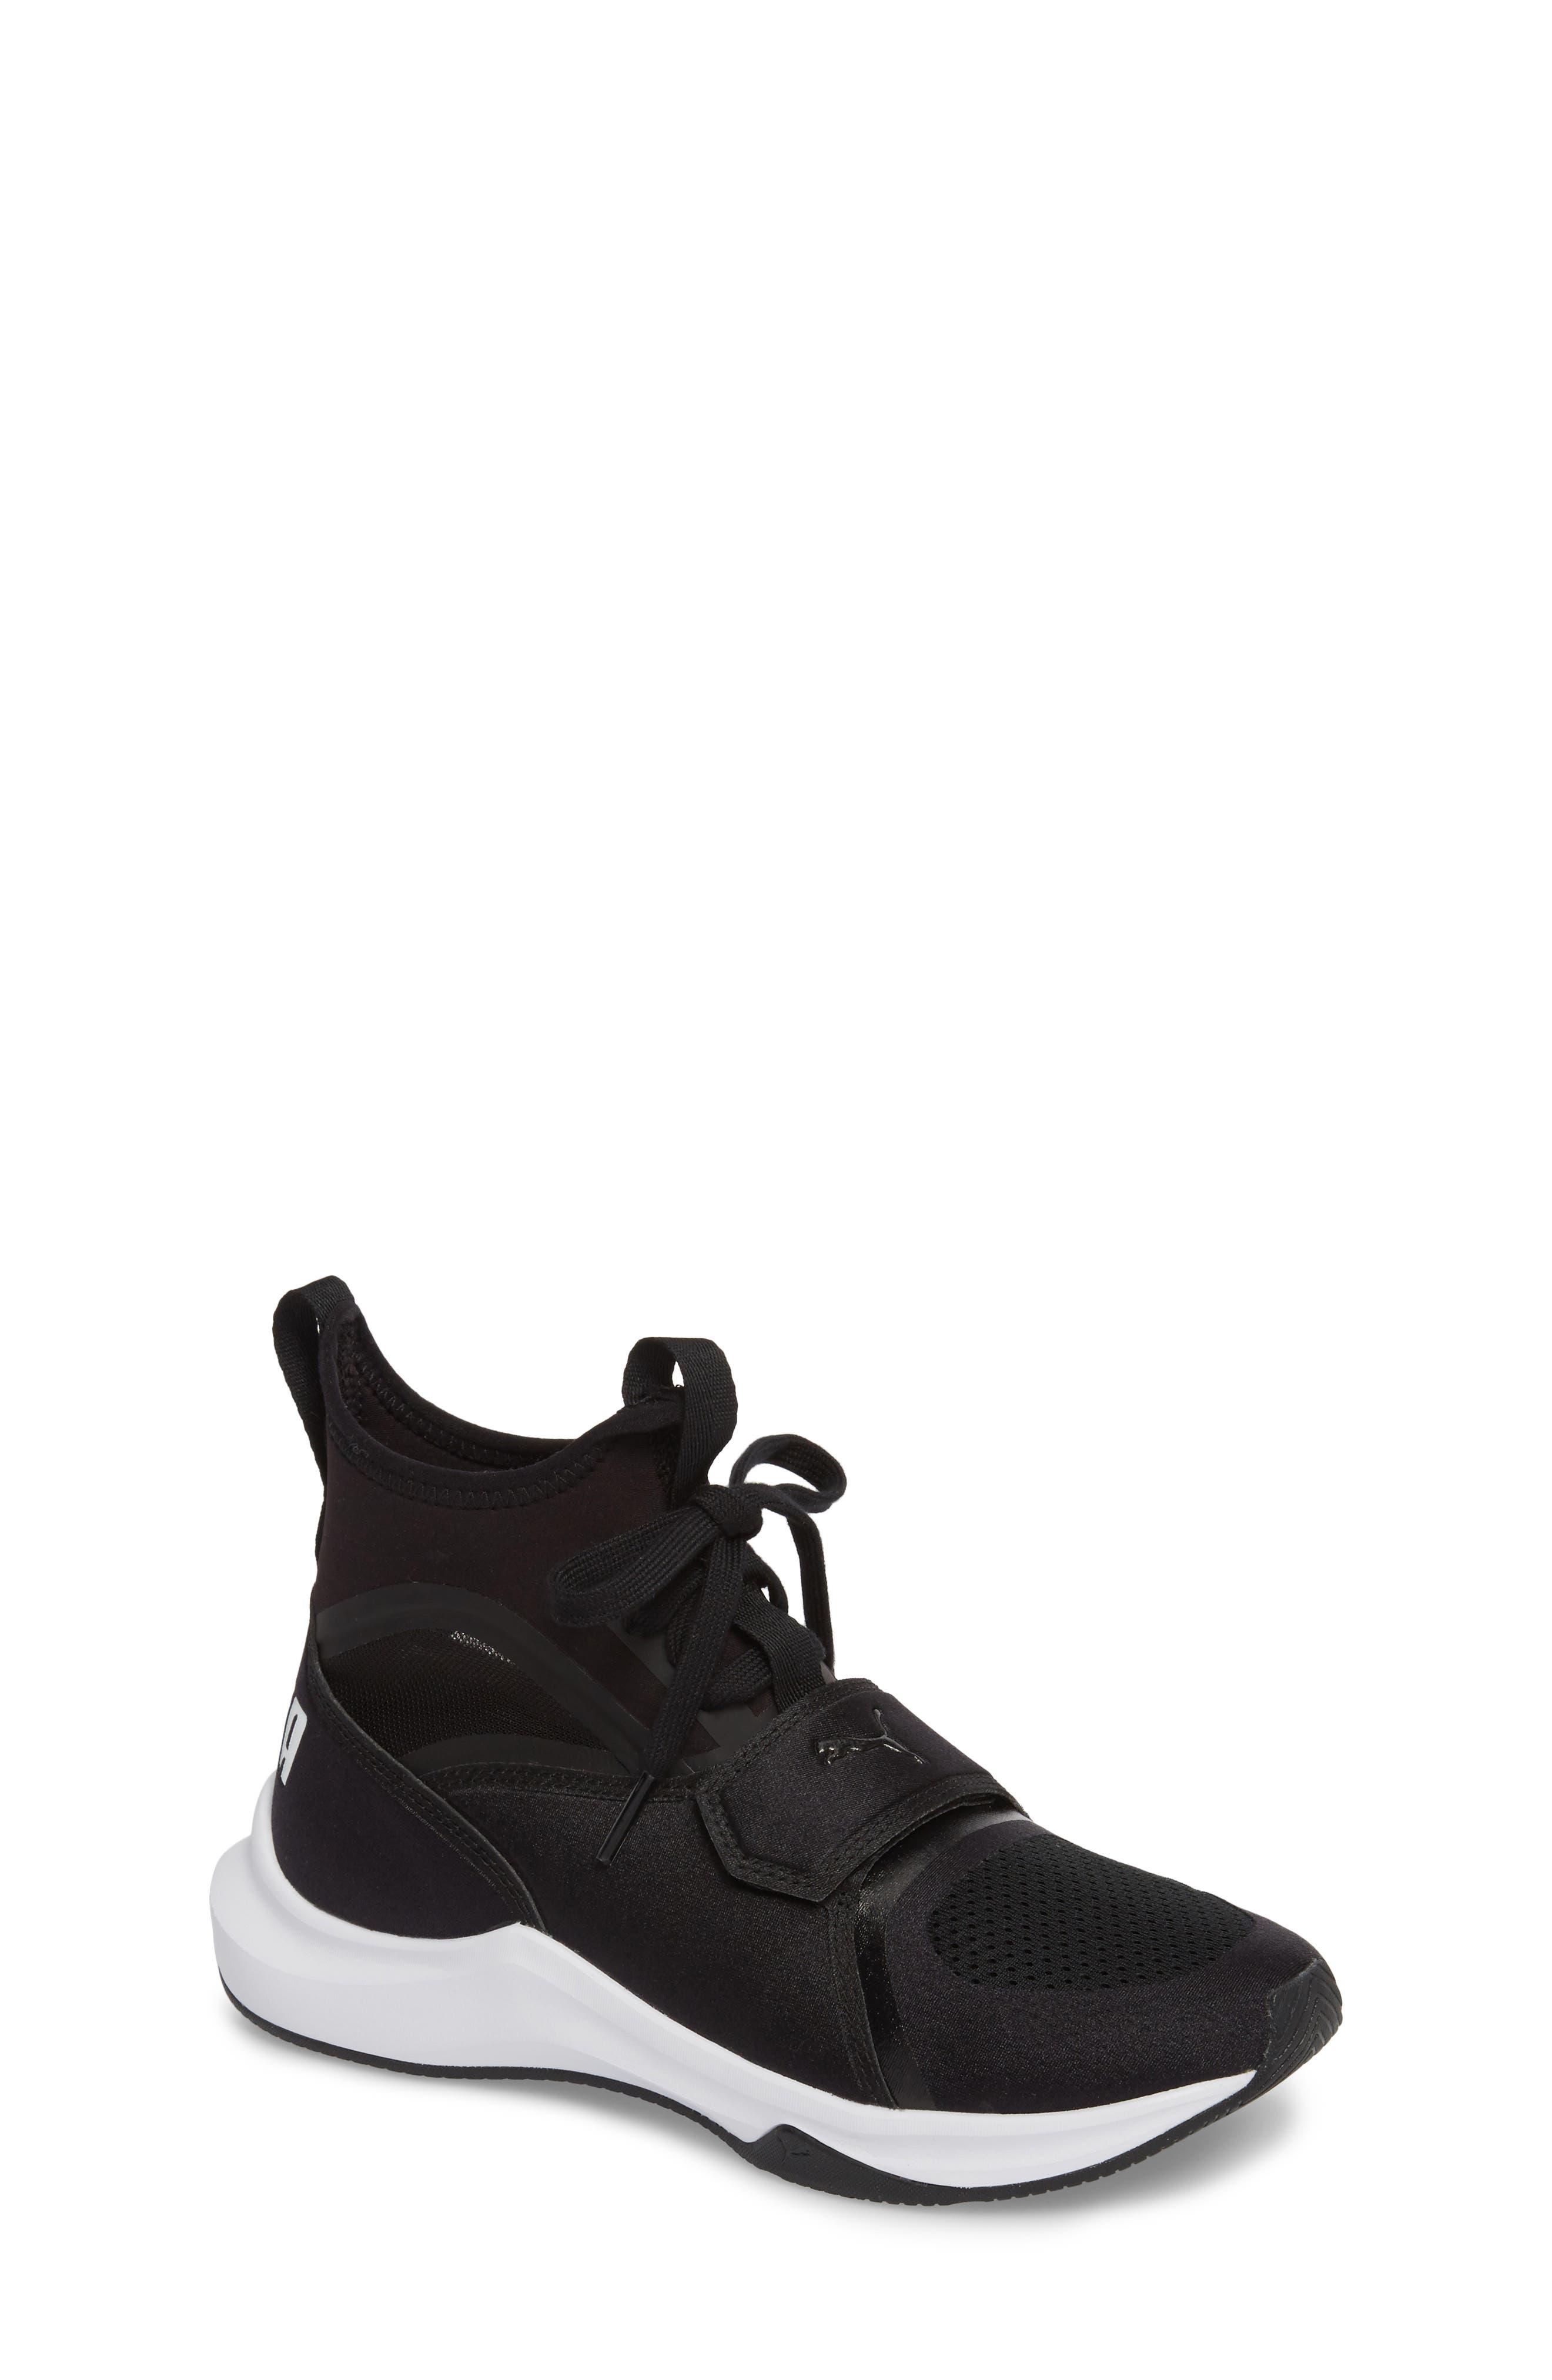 Phenom Jr High Top Sneaker,                         Main,                         color, 001